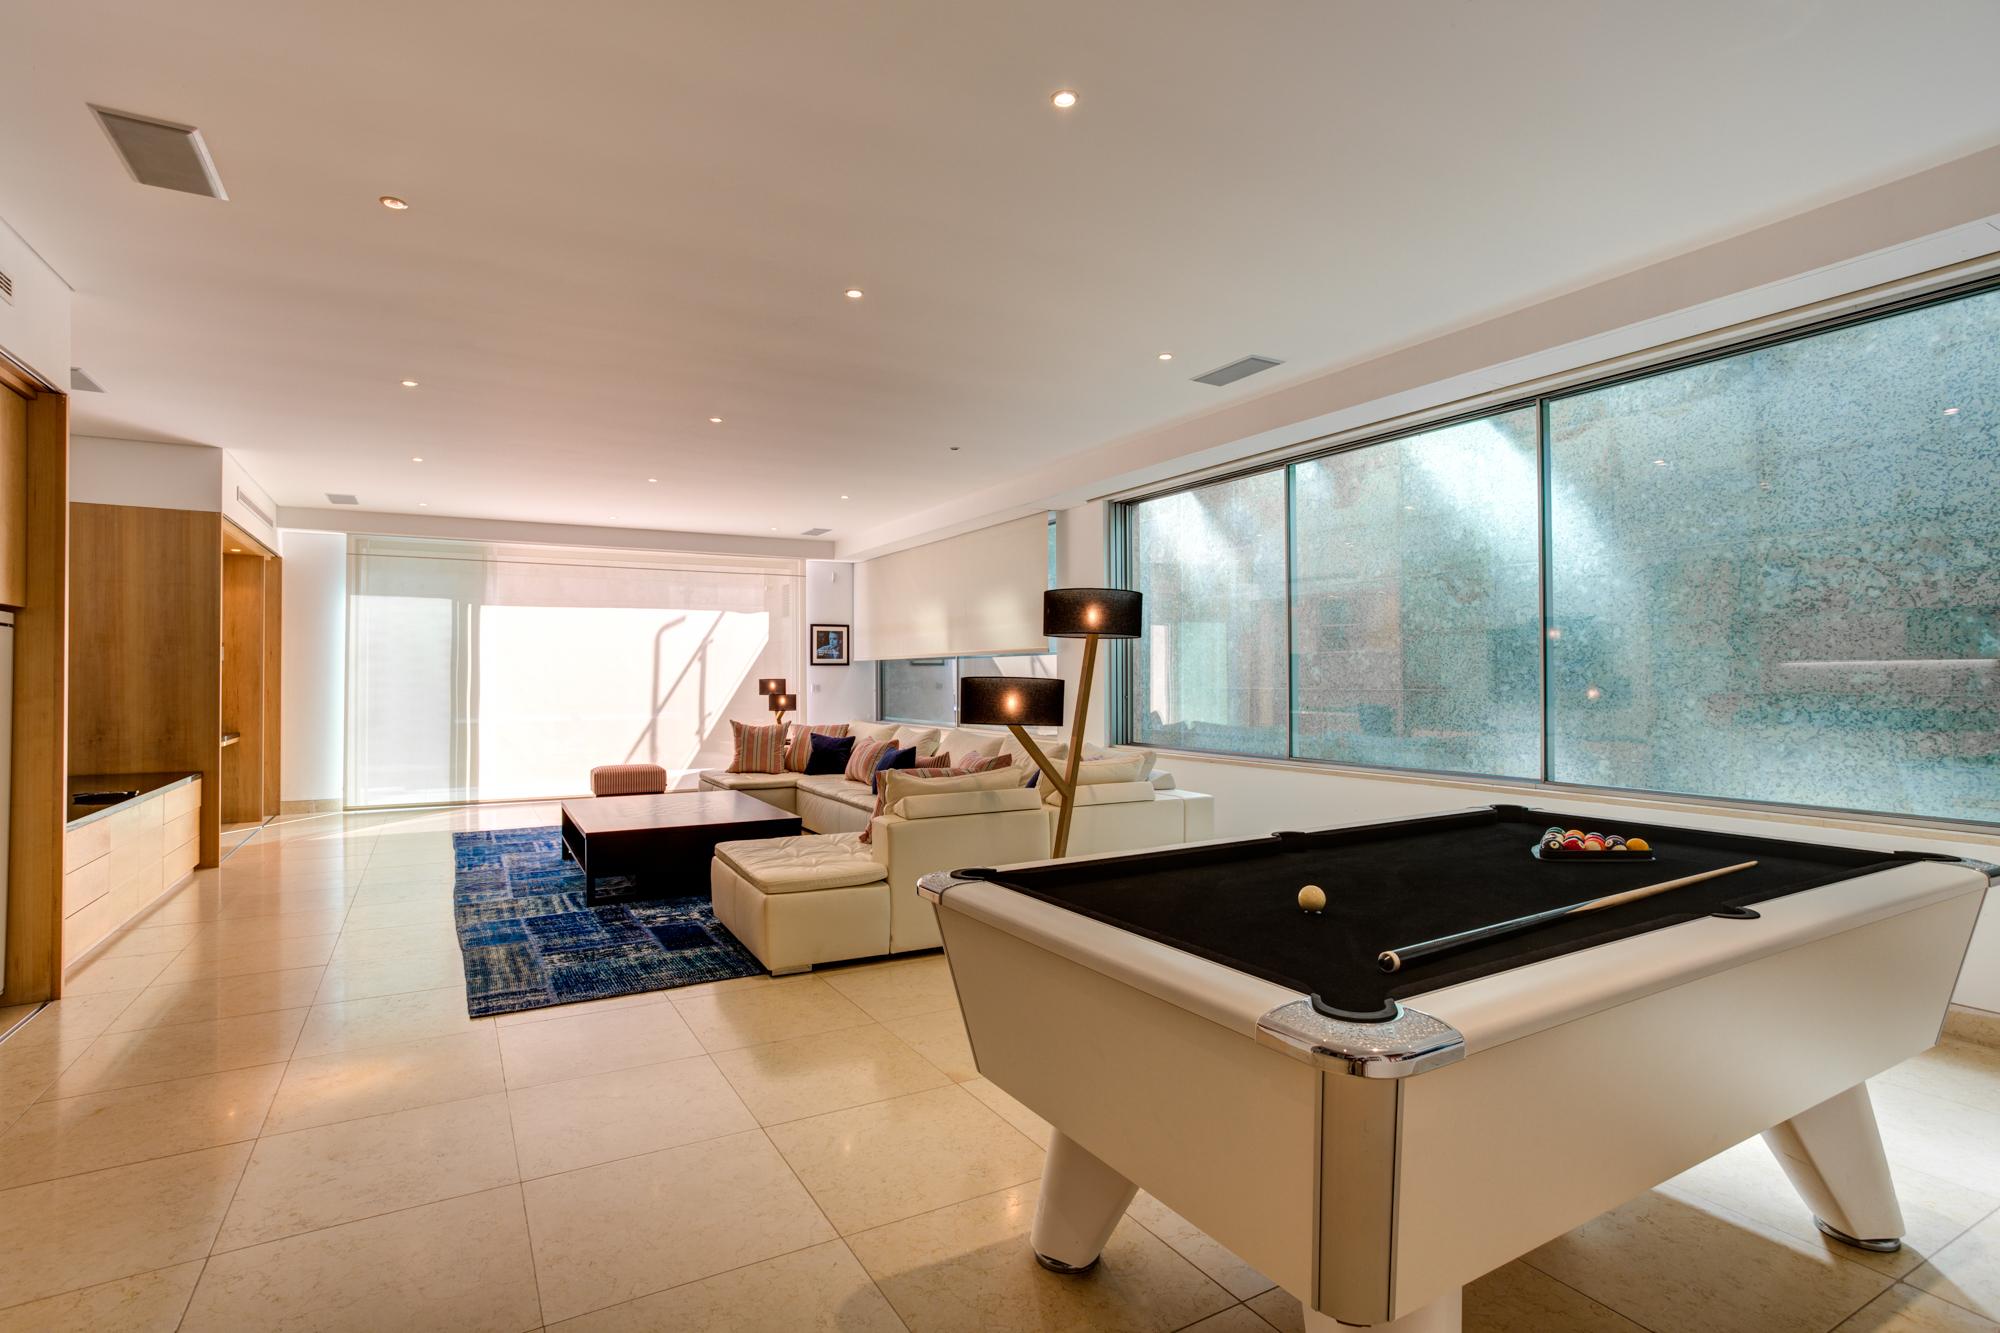 Villa Moon Sone, 5 bedroom prestige villa in Quinta do Lago, Algarve,games room.jpg